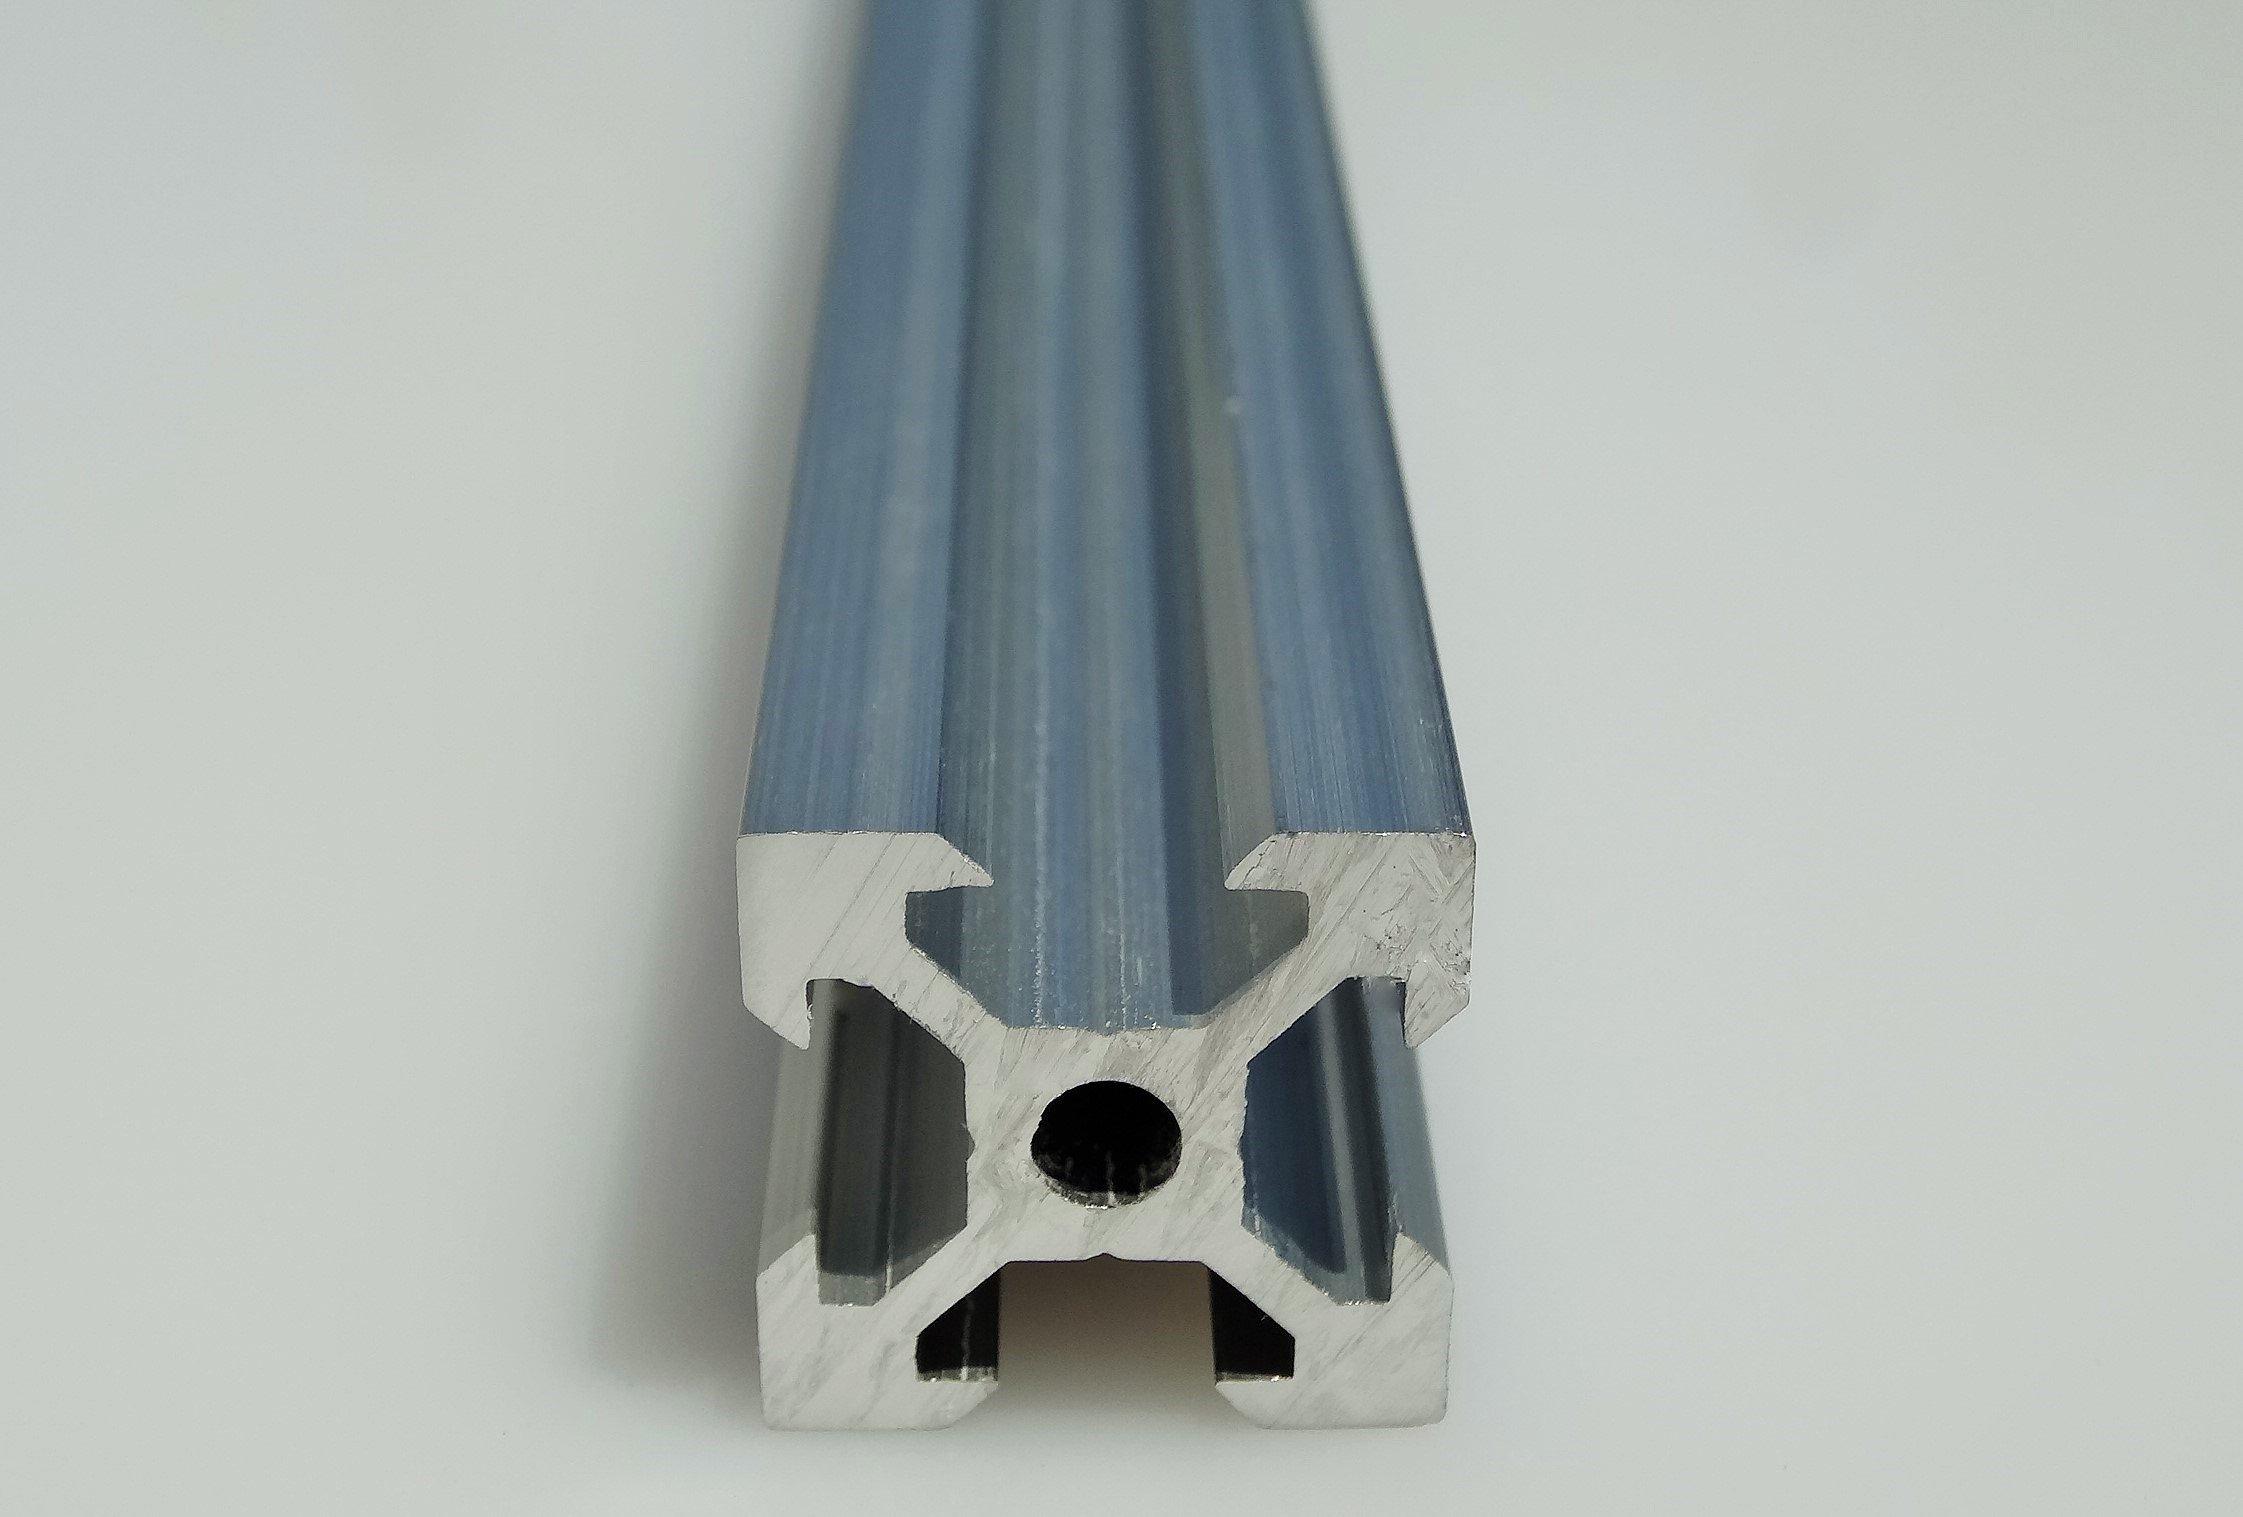 V-Slot Linear Rail - 1500mm Length (20mm x 20mm)